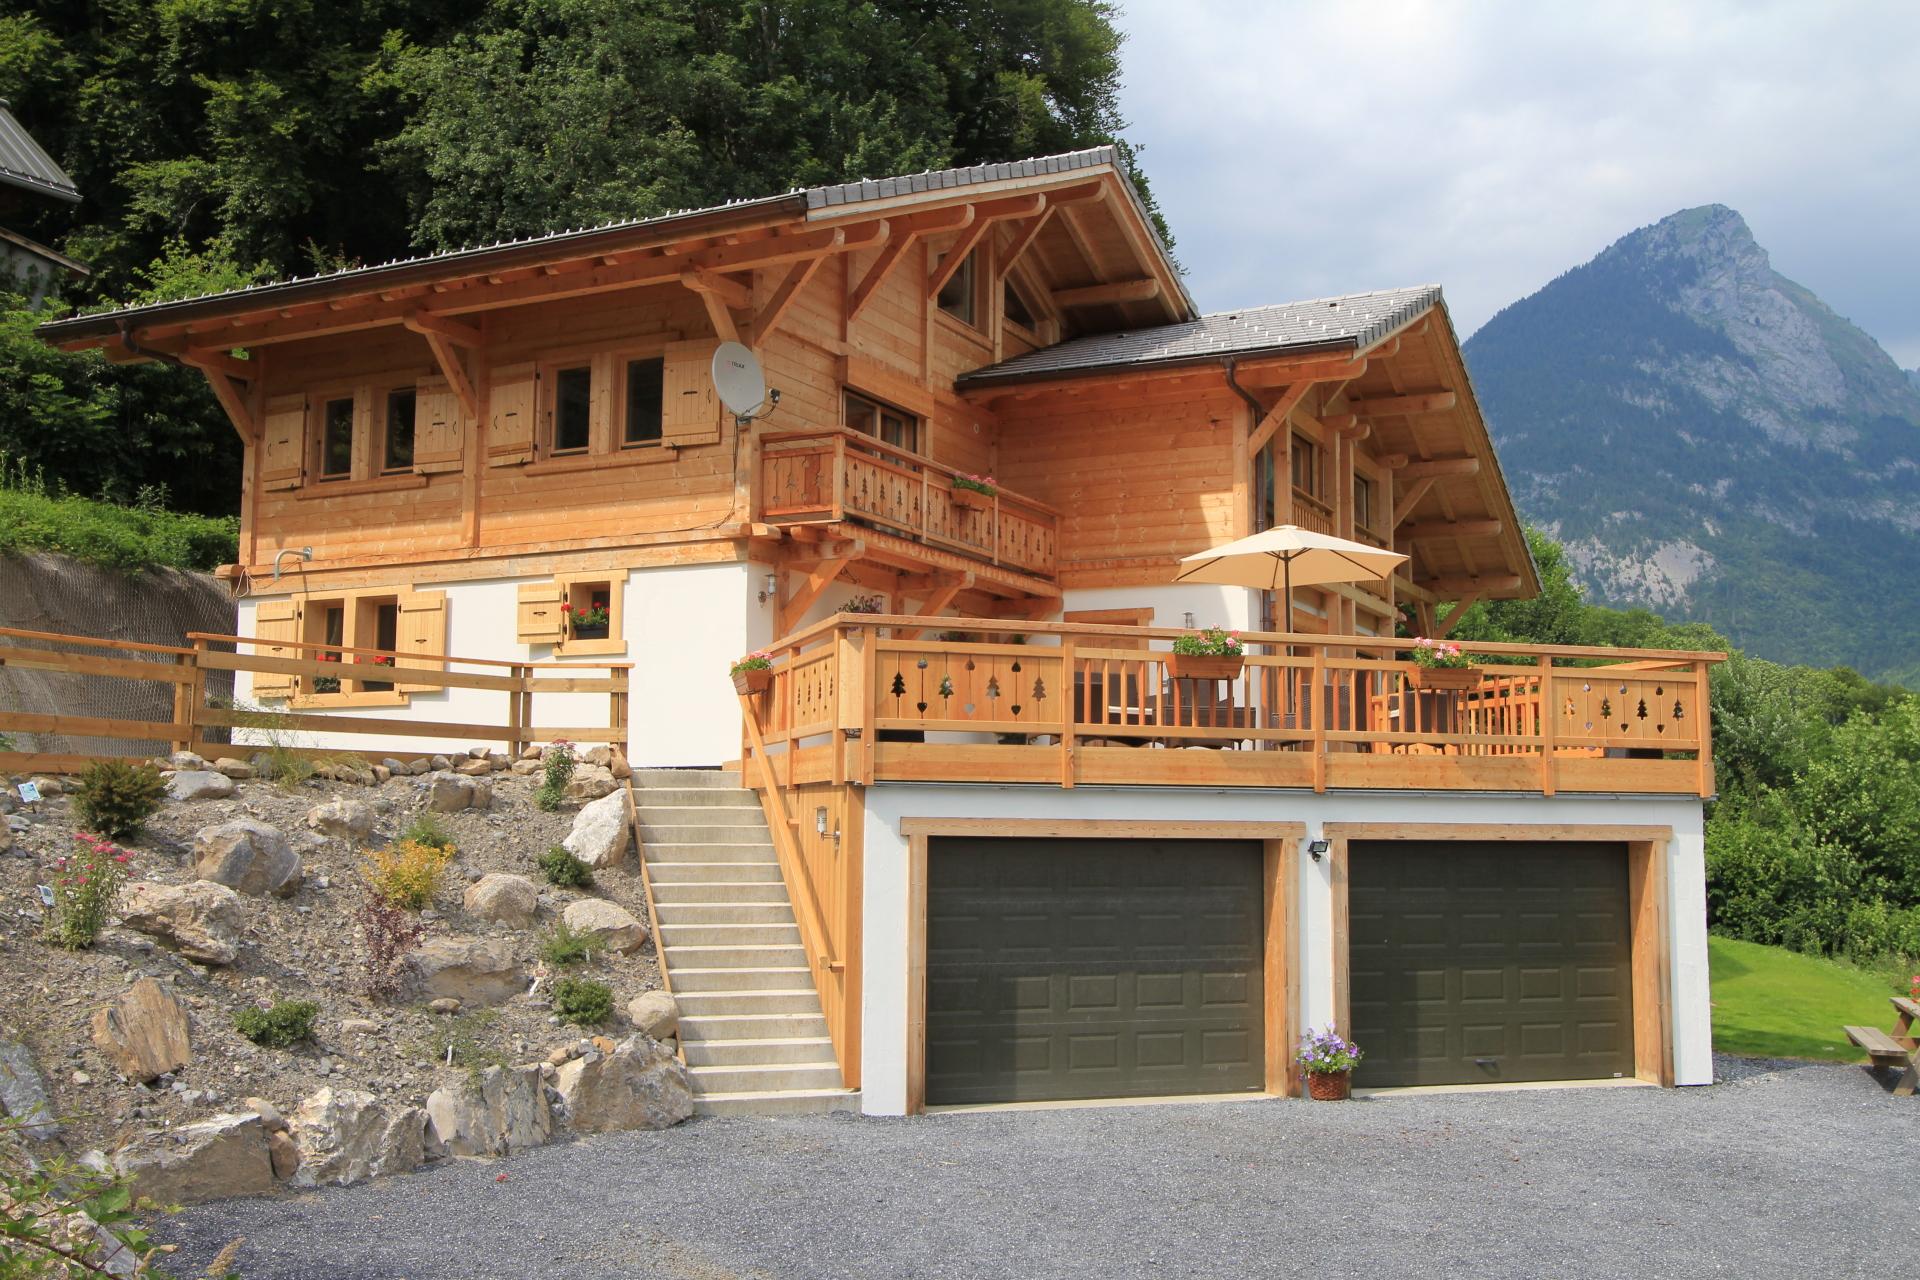 New balconies, terrace & landscaping on Samoens chalet | Renovation Solutions